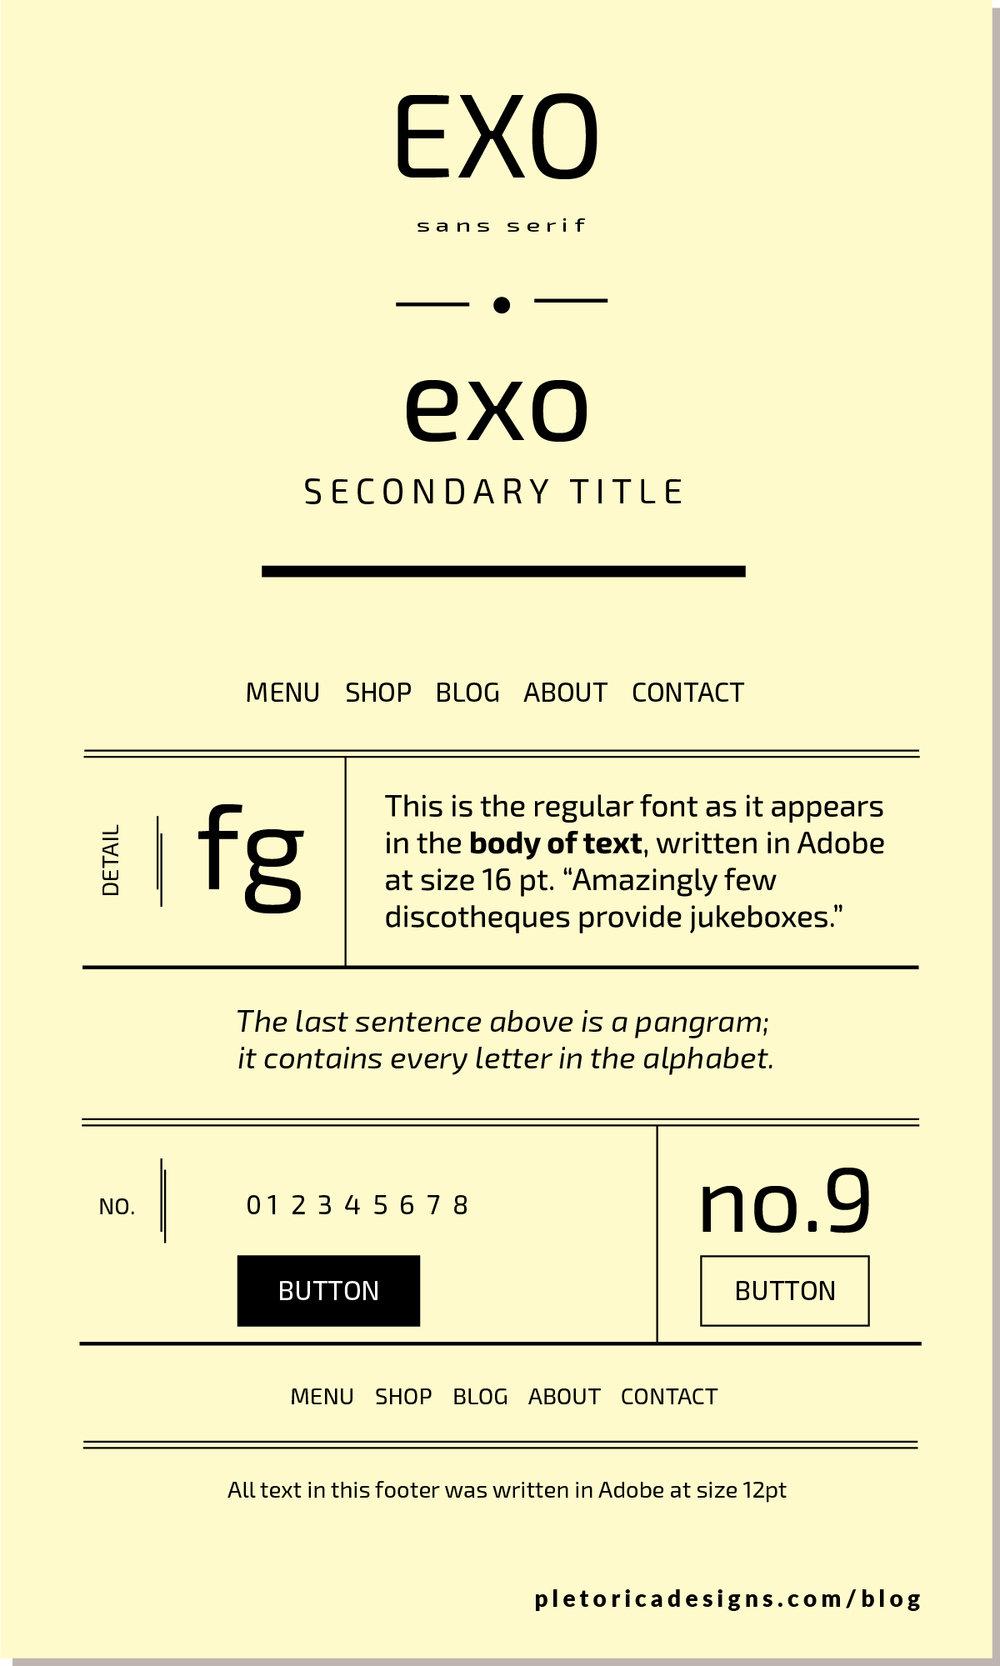 LET'S TYPE: Exo — PLETÓRICA DESIGNS